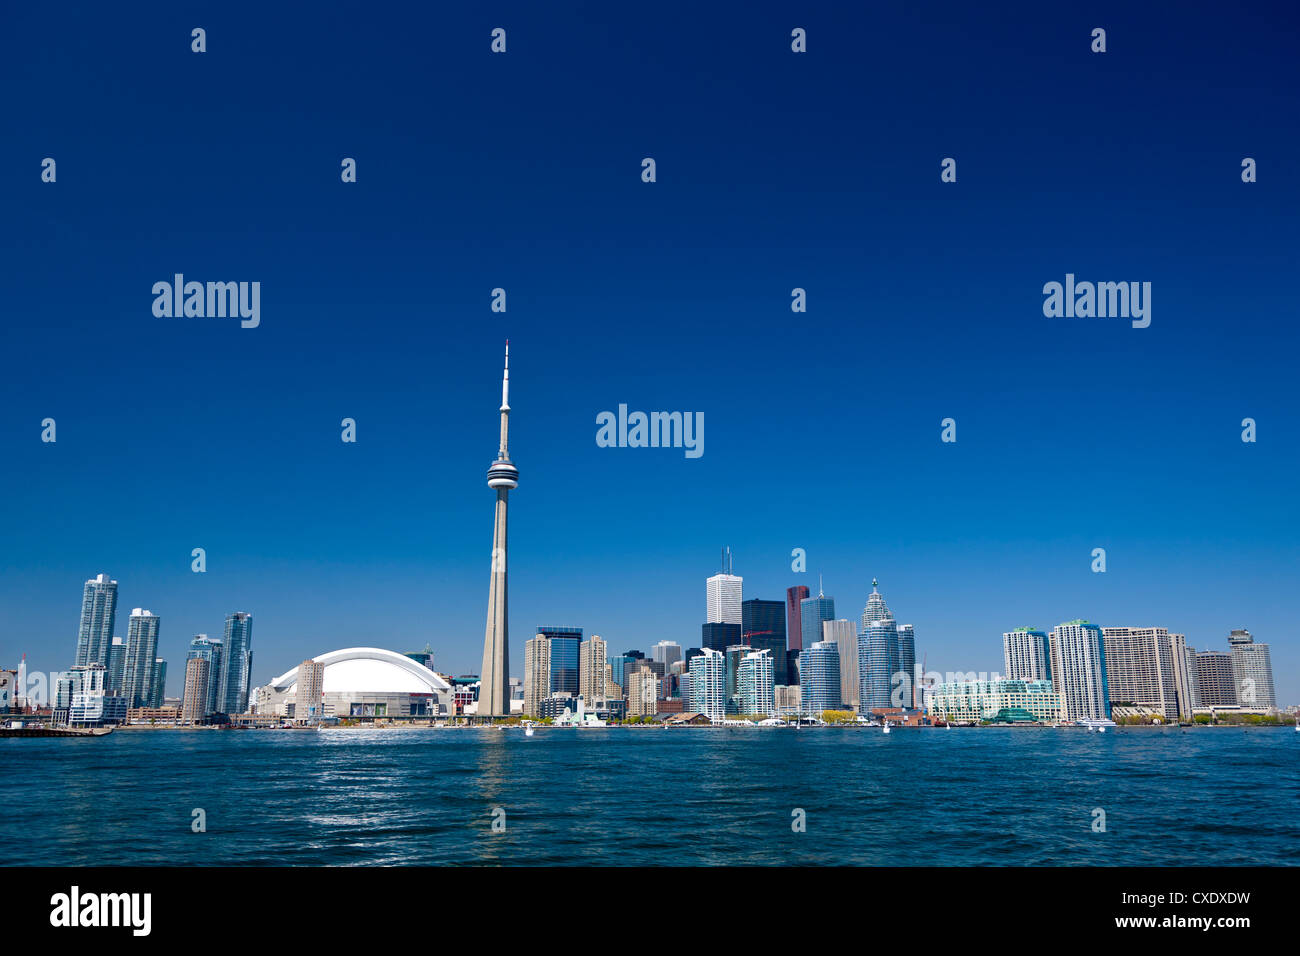 City skyline showing CN Tower, Toronto, Ontario, Canada, North America - Stock Image